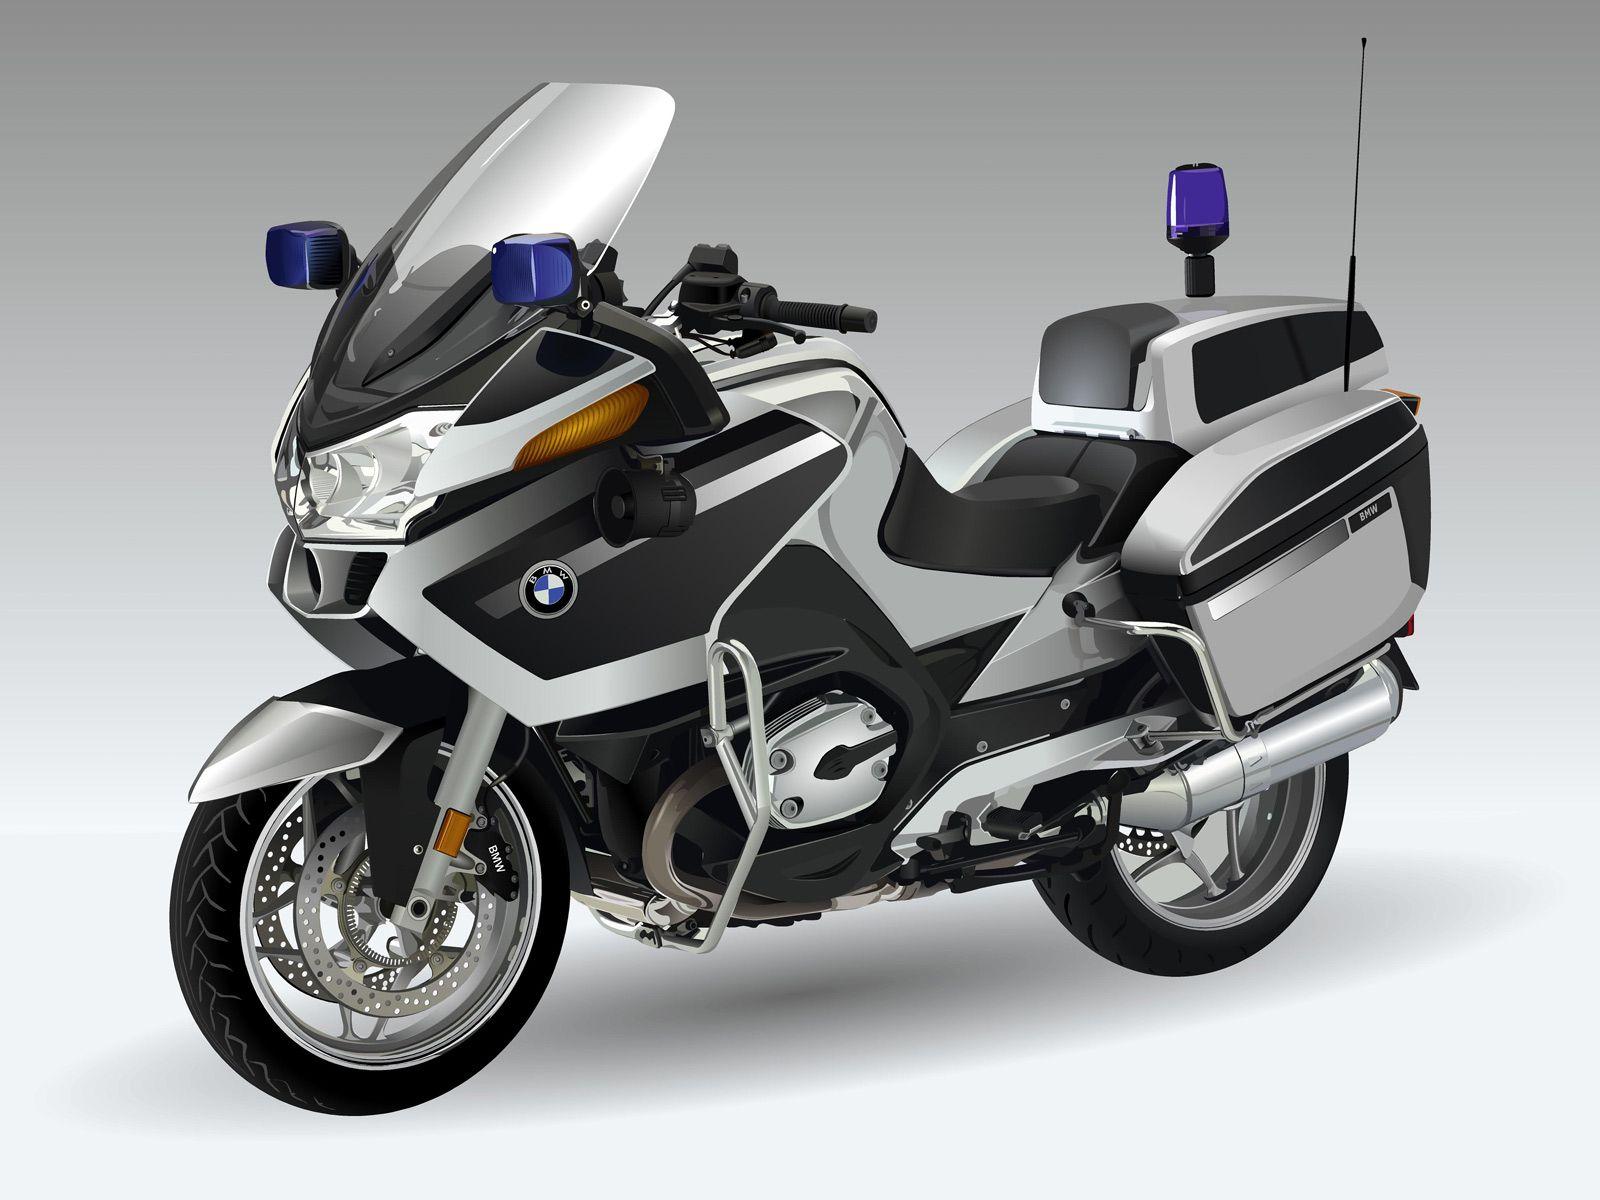 bmw police motorcycle [ 1600 x 1200 Pixel ]